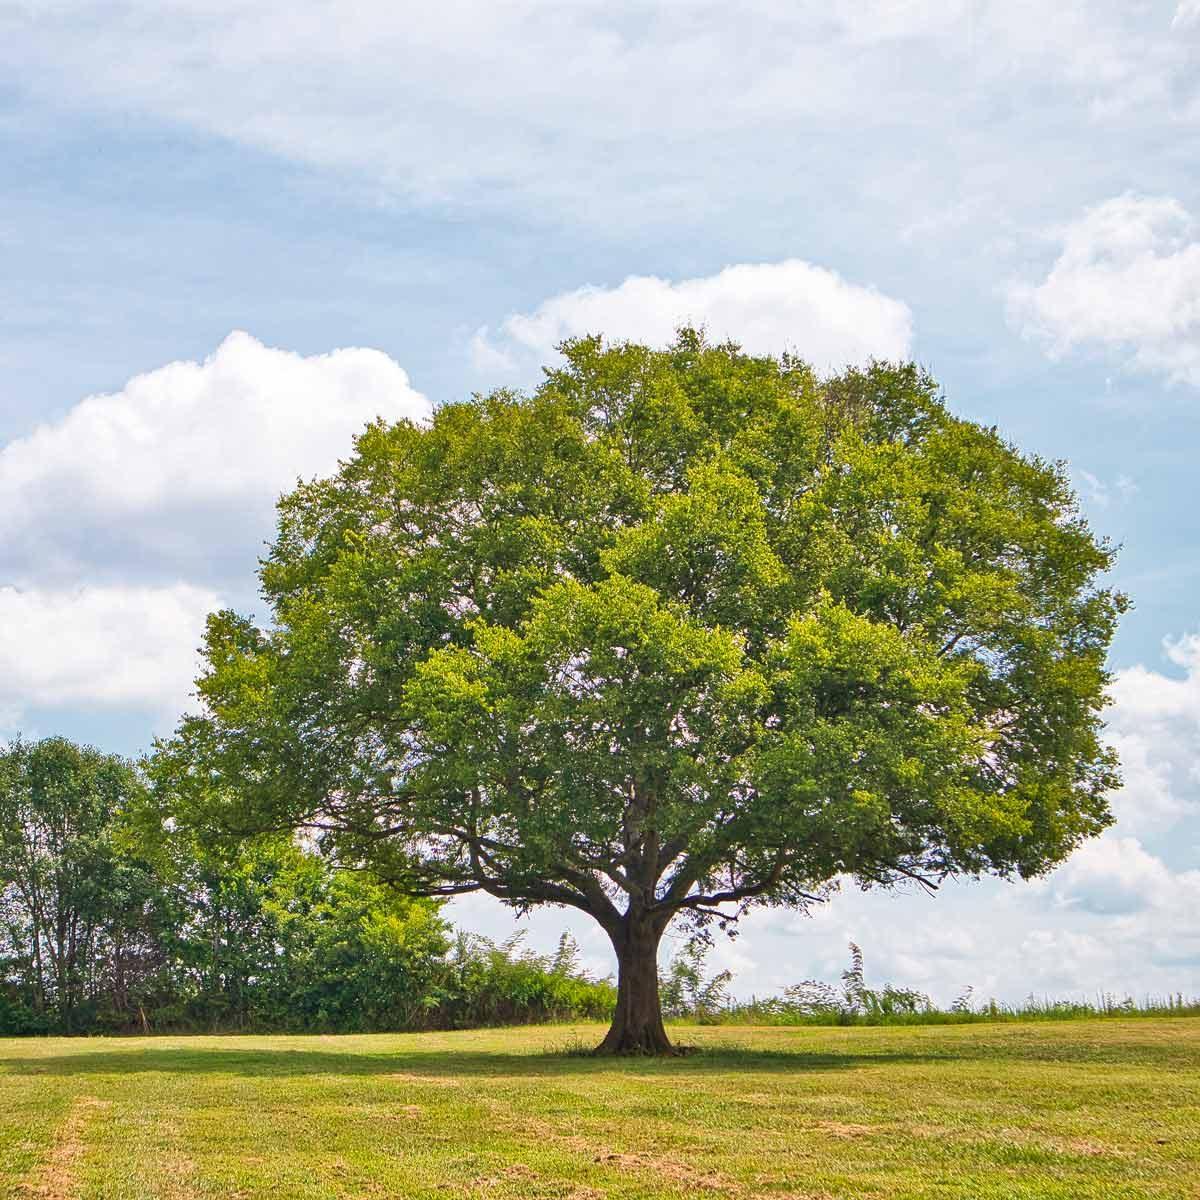 large tree in open yard